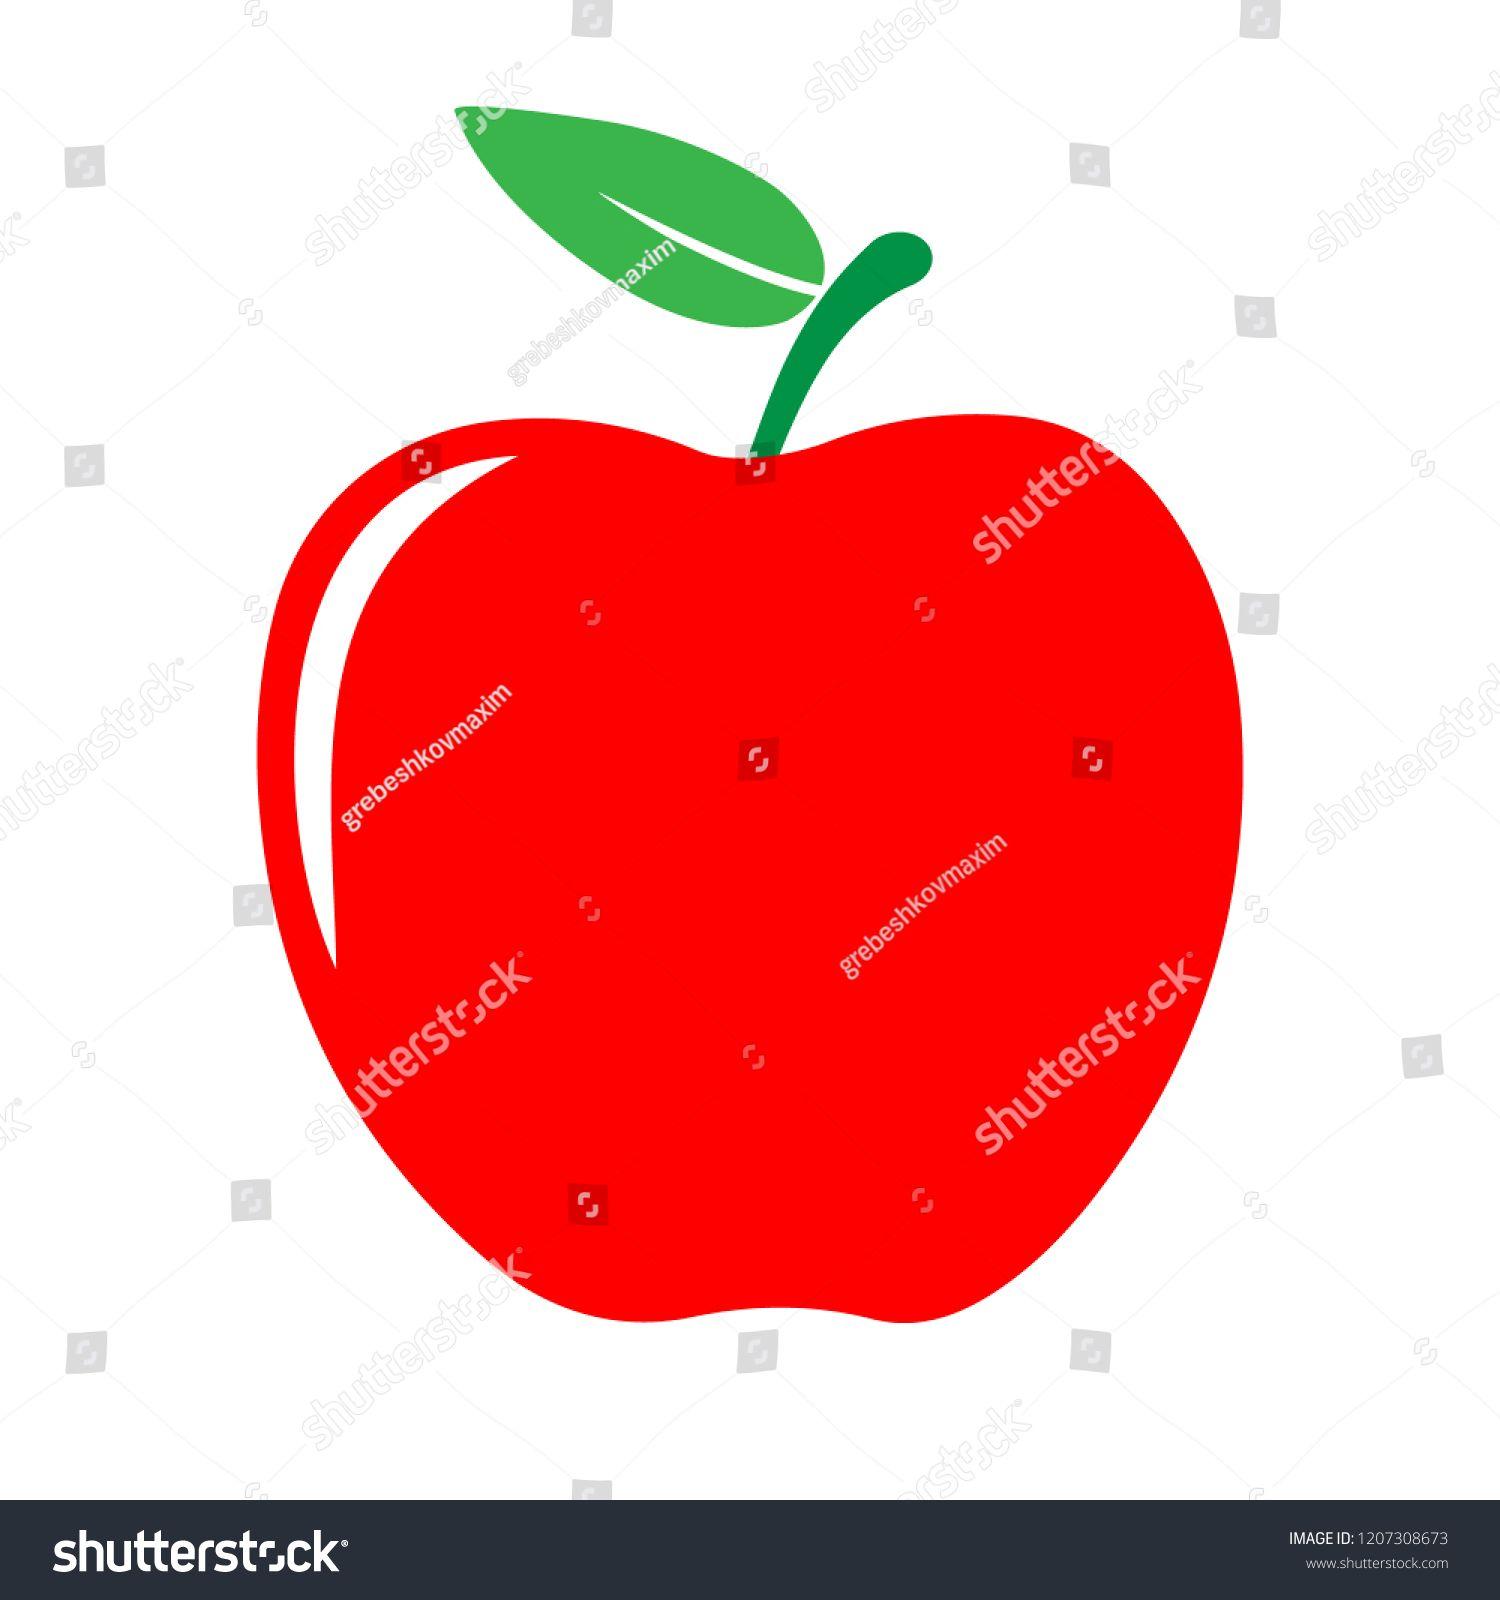 Red Apple Icon Vector Illustration Sponsored Affiliate Apple Red Icon Illustration Apple Icon Red Apple Vector Illustration